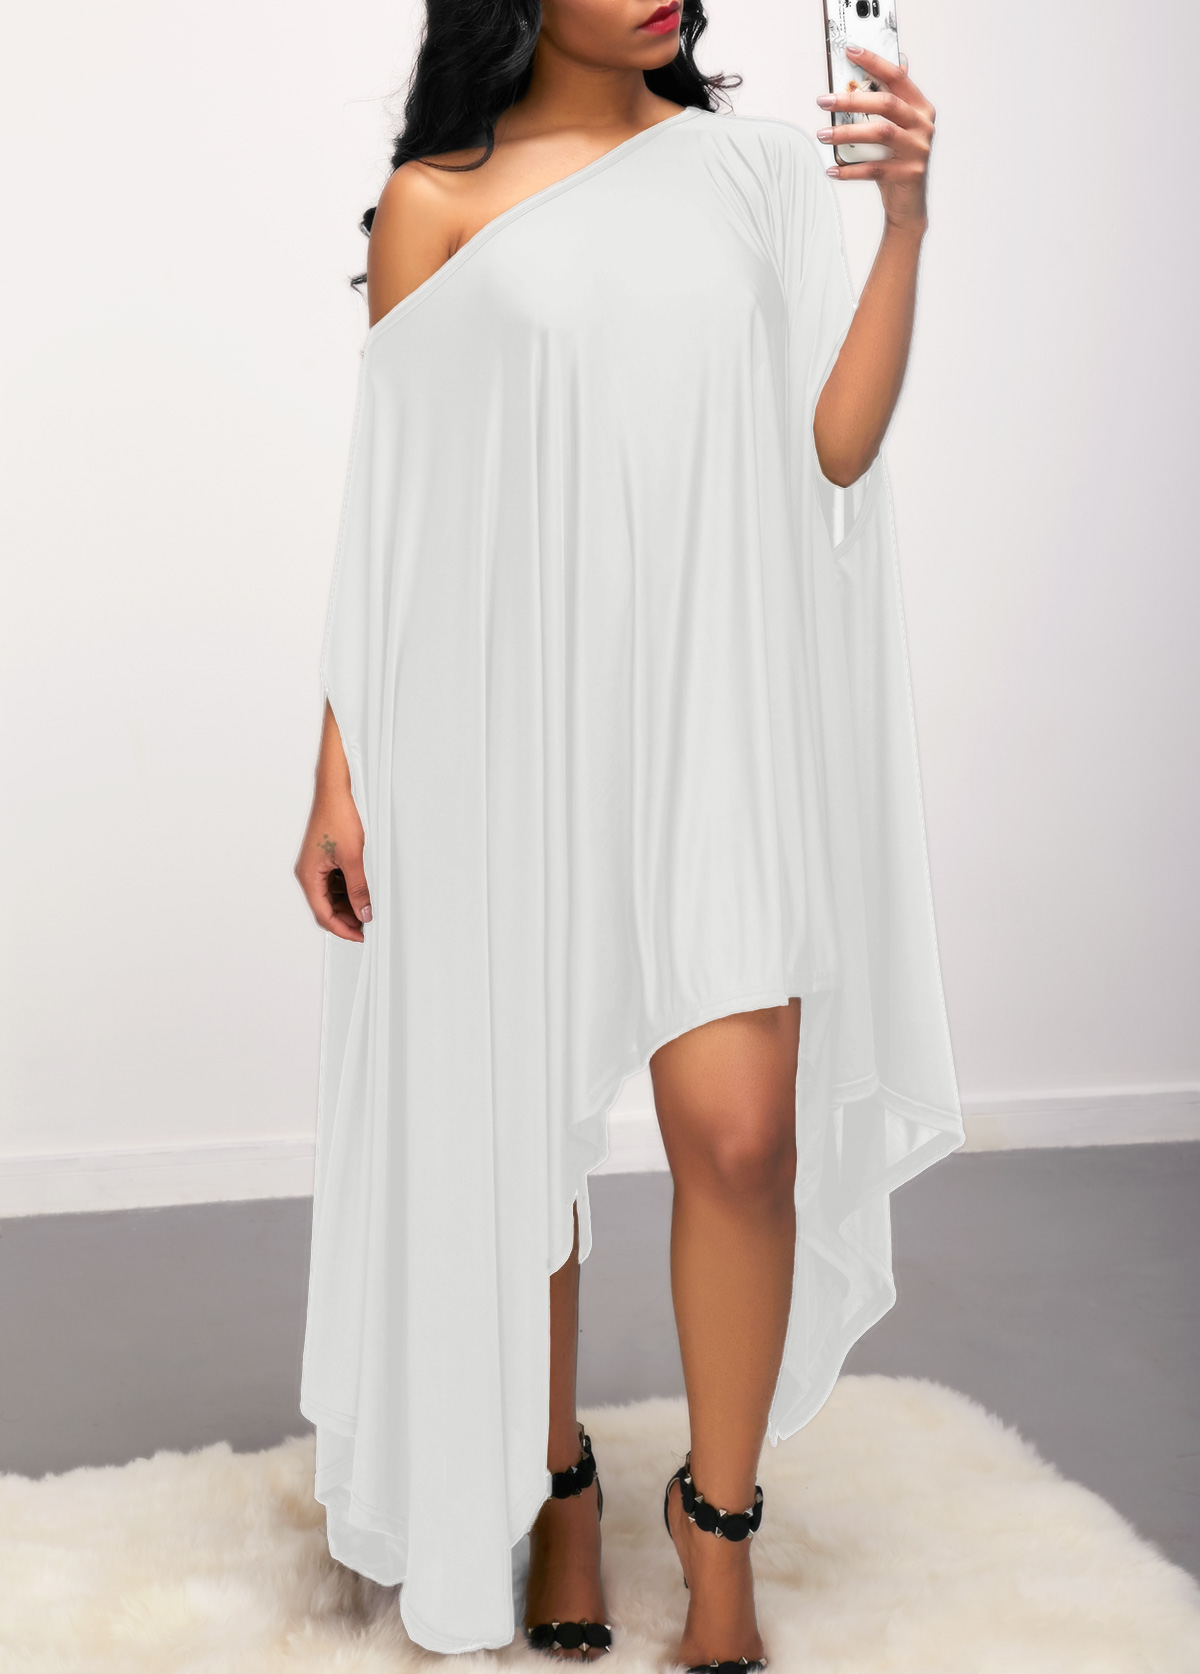 White Skew Neck Batwing Sleeve Asymmetric Hem Dress